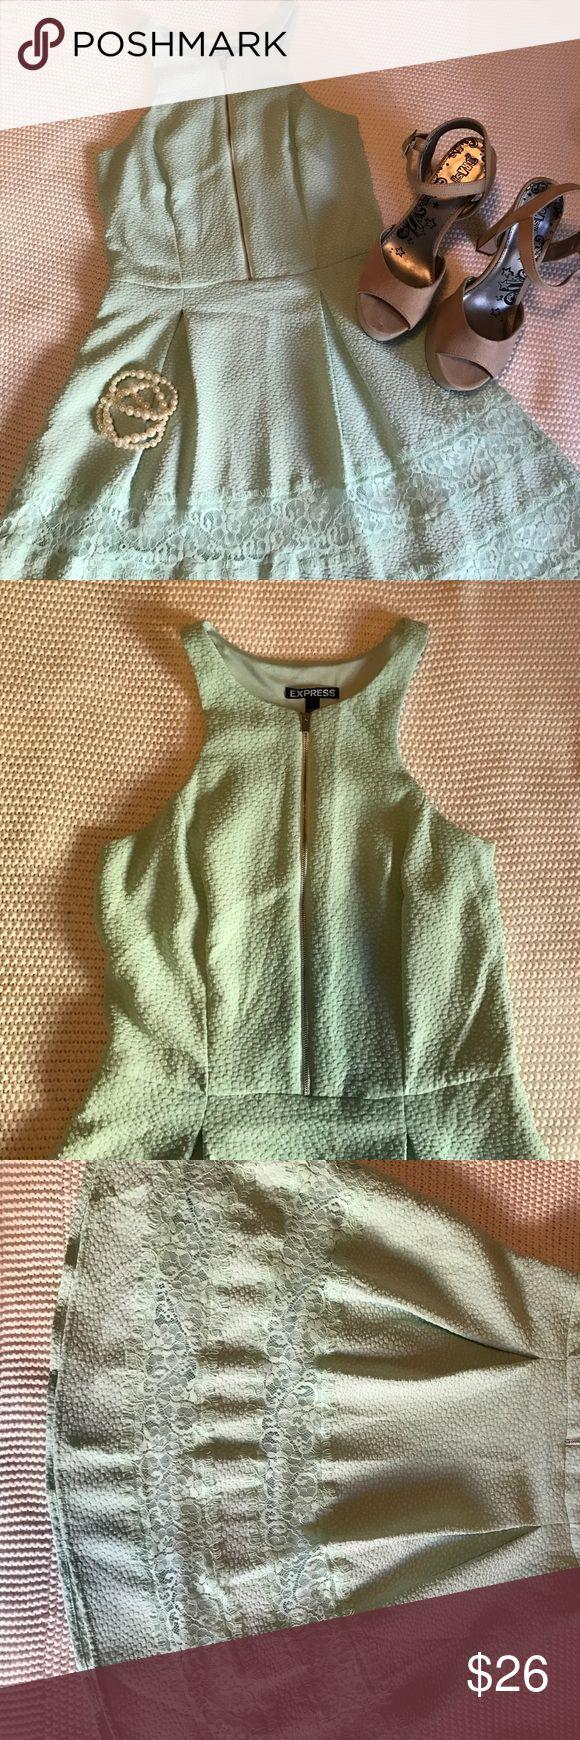 🎉SALE🎉Express Mint Short Dress Size 2. Runs like an S. Only has been worn once. Express Dresses Mini